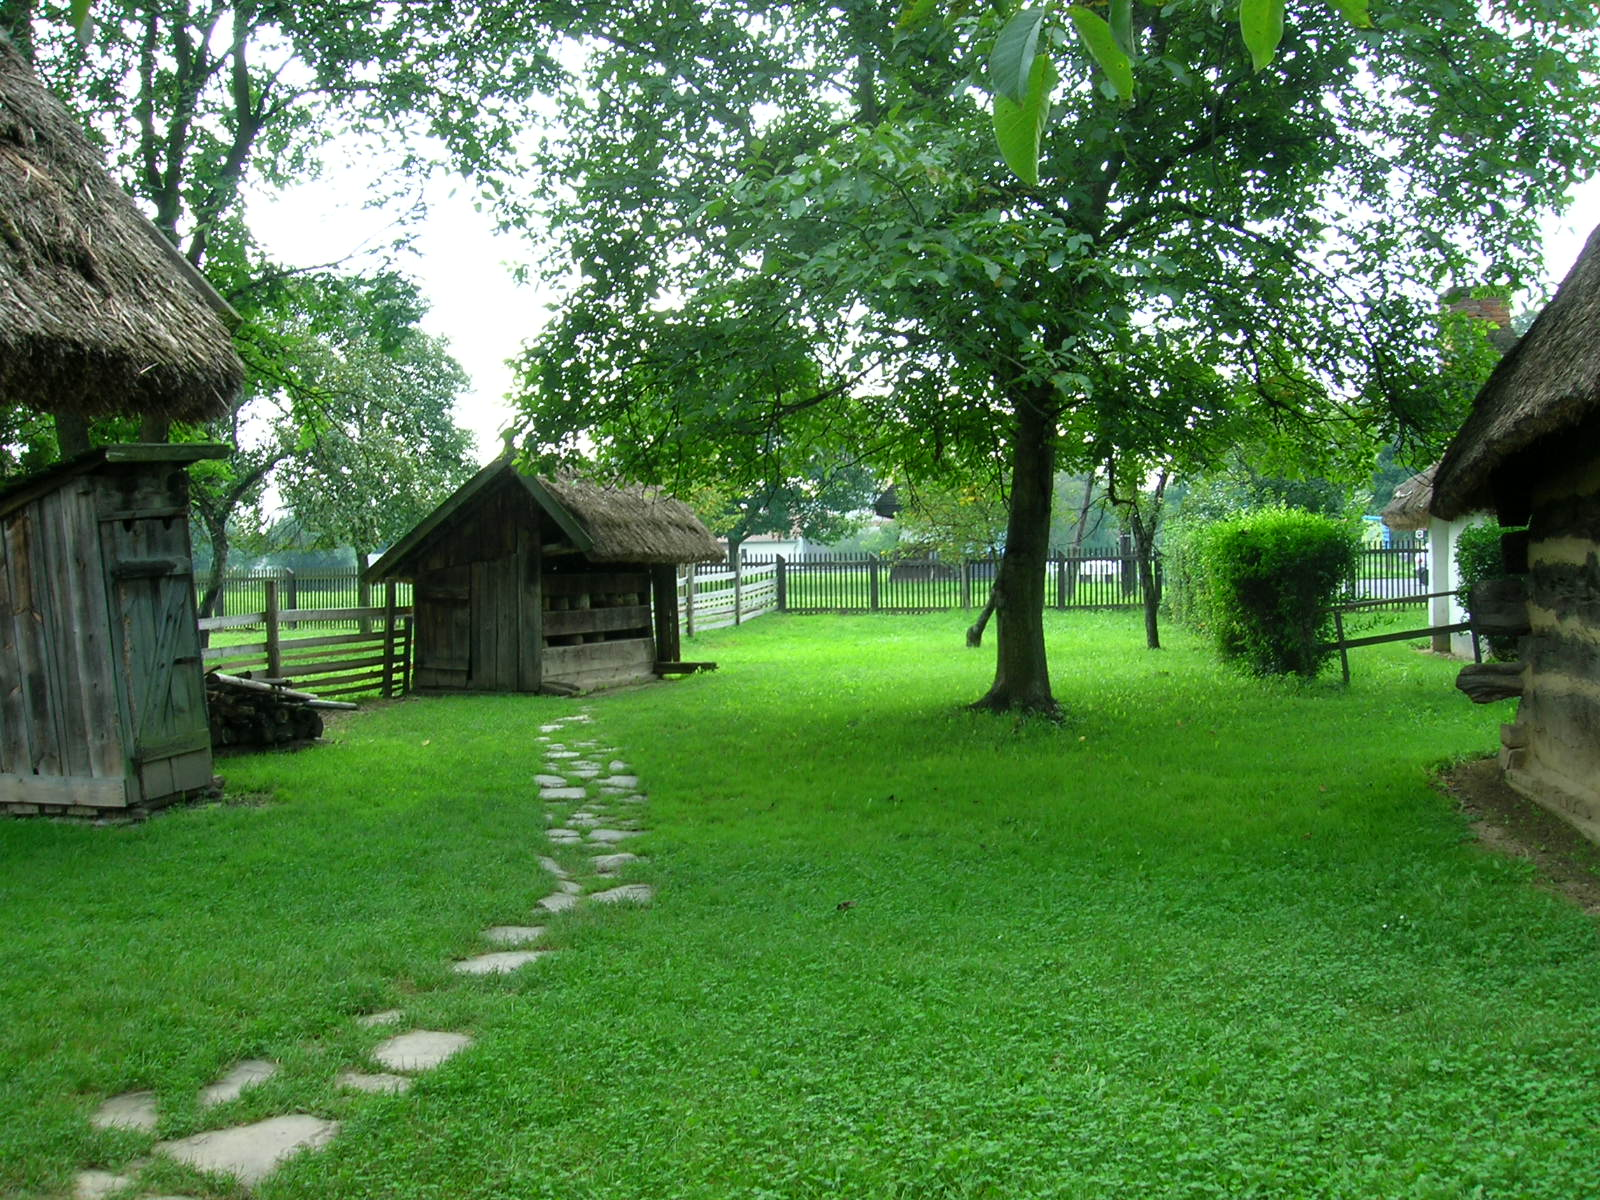 Filegocsej Village House Backyardjpg